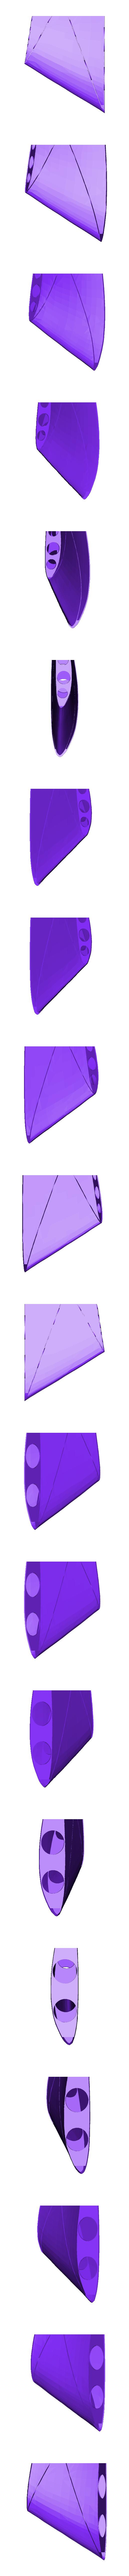 Wing R1.obj Download free OBJ file Small Static Horten 229 • 3D printable object, francoispeyper